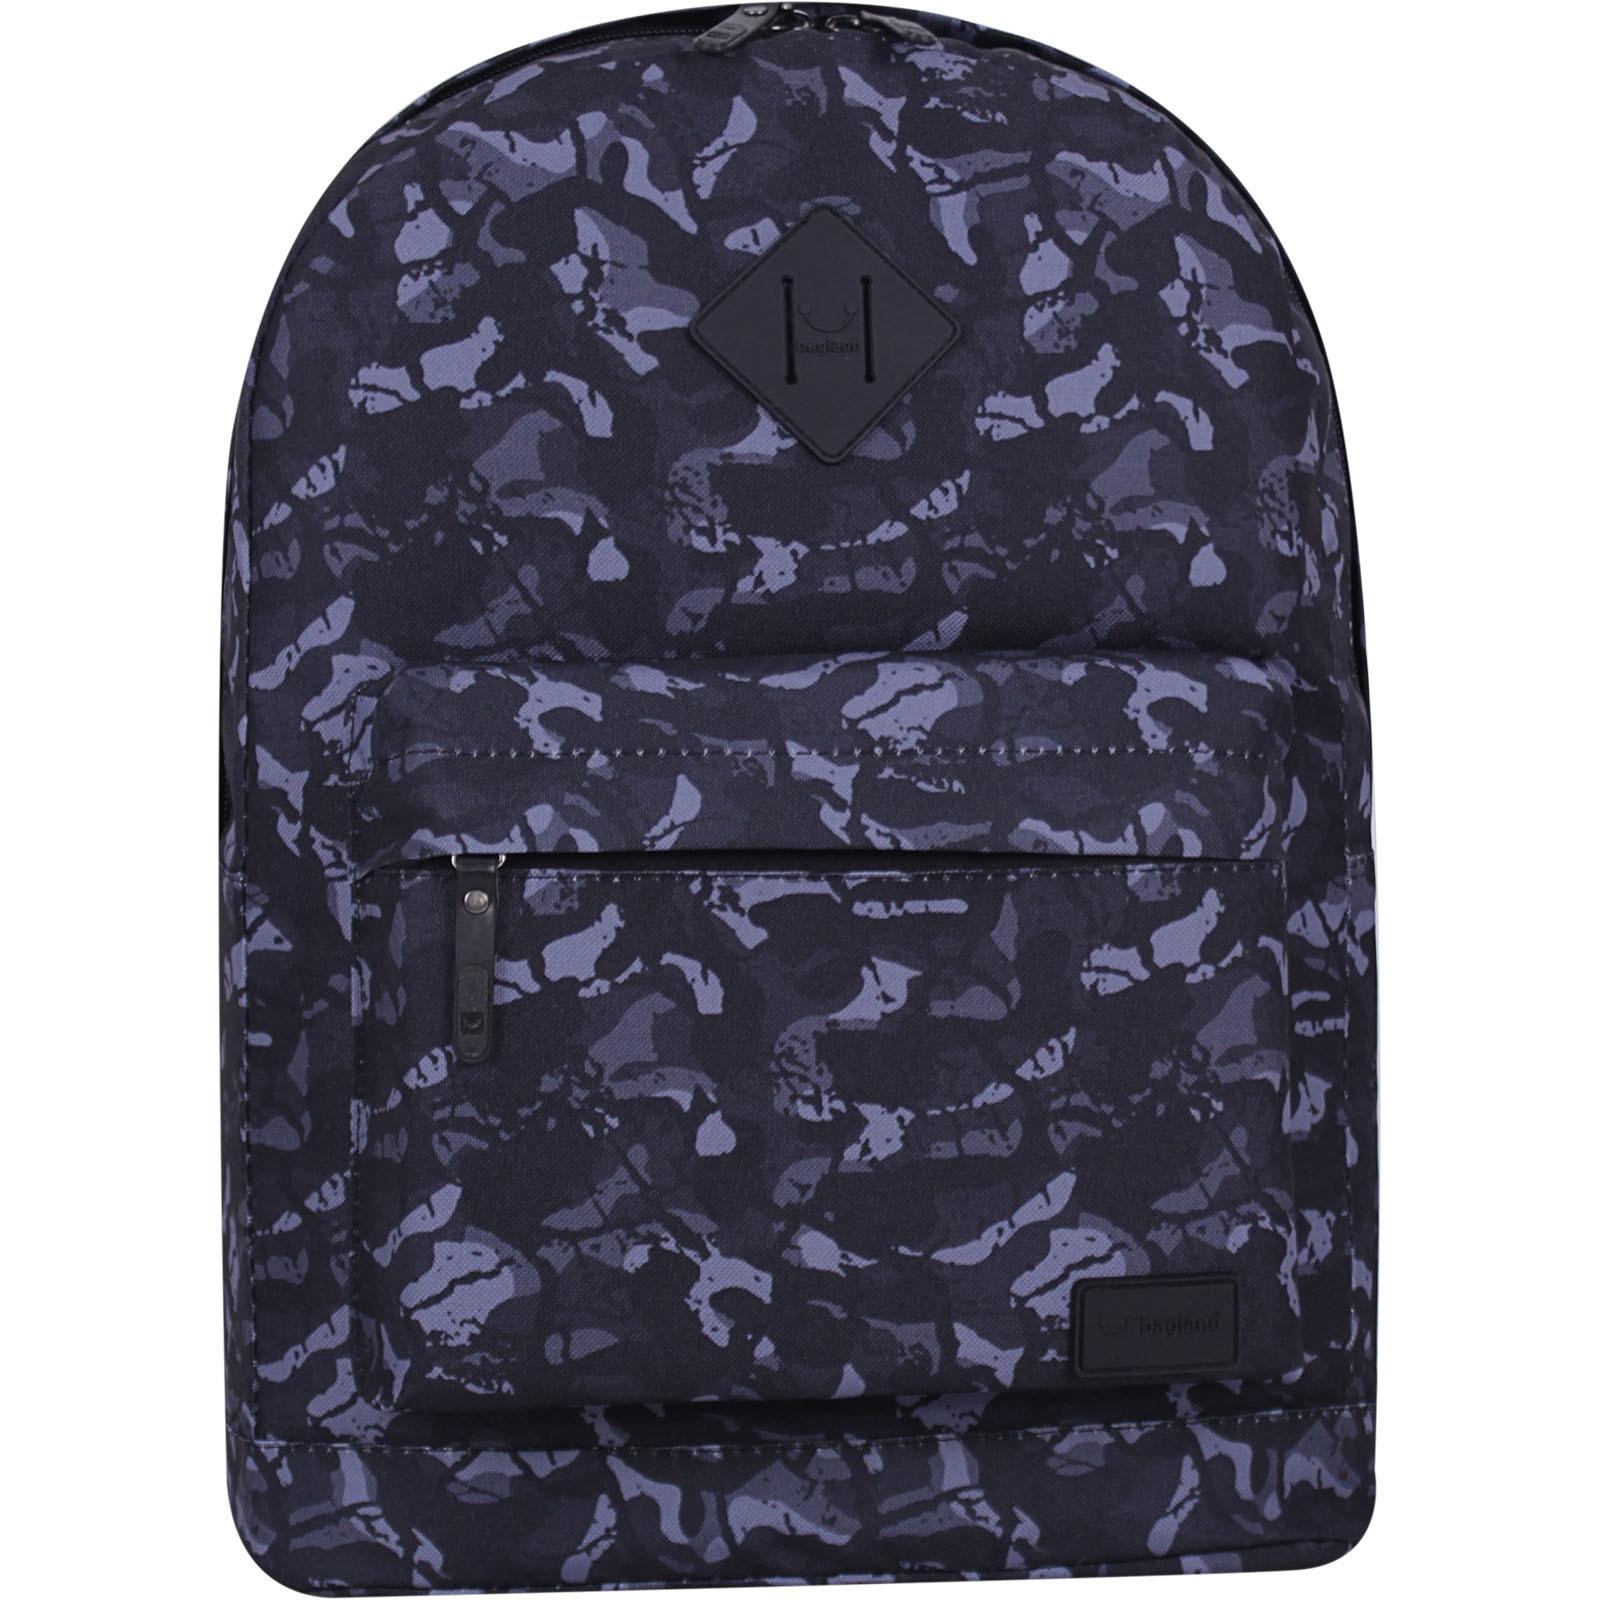 Молодежные рюкзаки Рюкзак Bagland Молодежный 17 л. сублимация 465 (00533664) IMG_9333_суб465_-1600.jpg